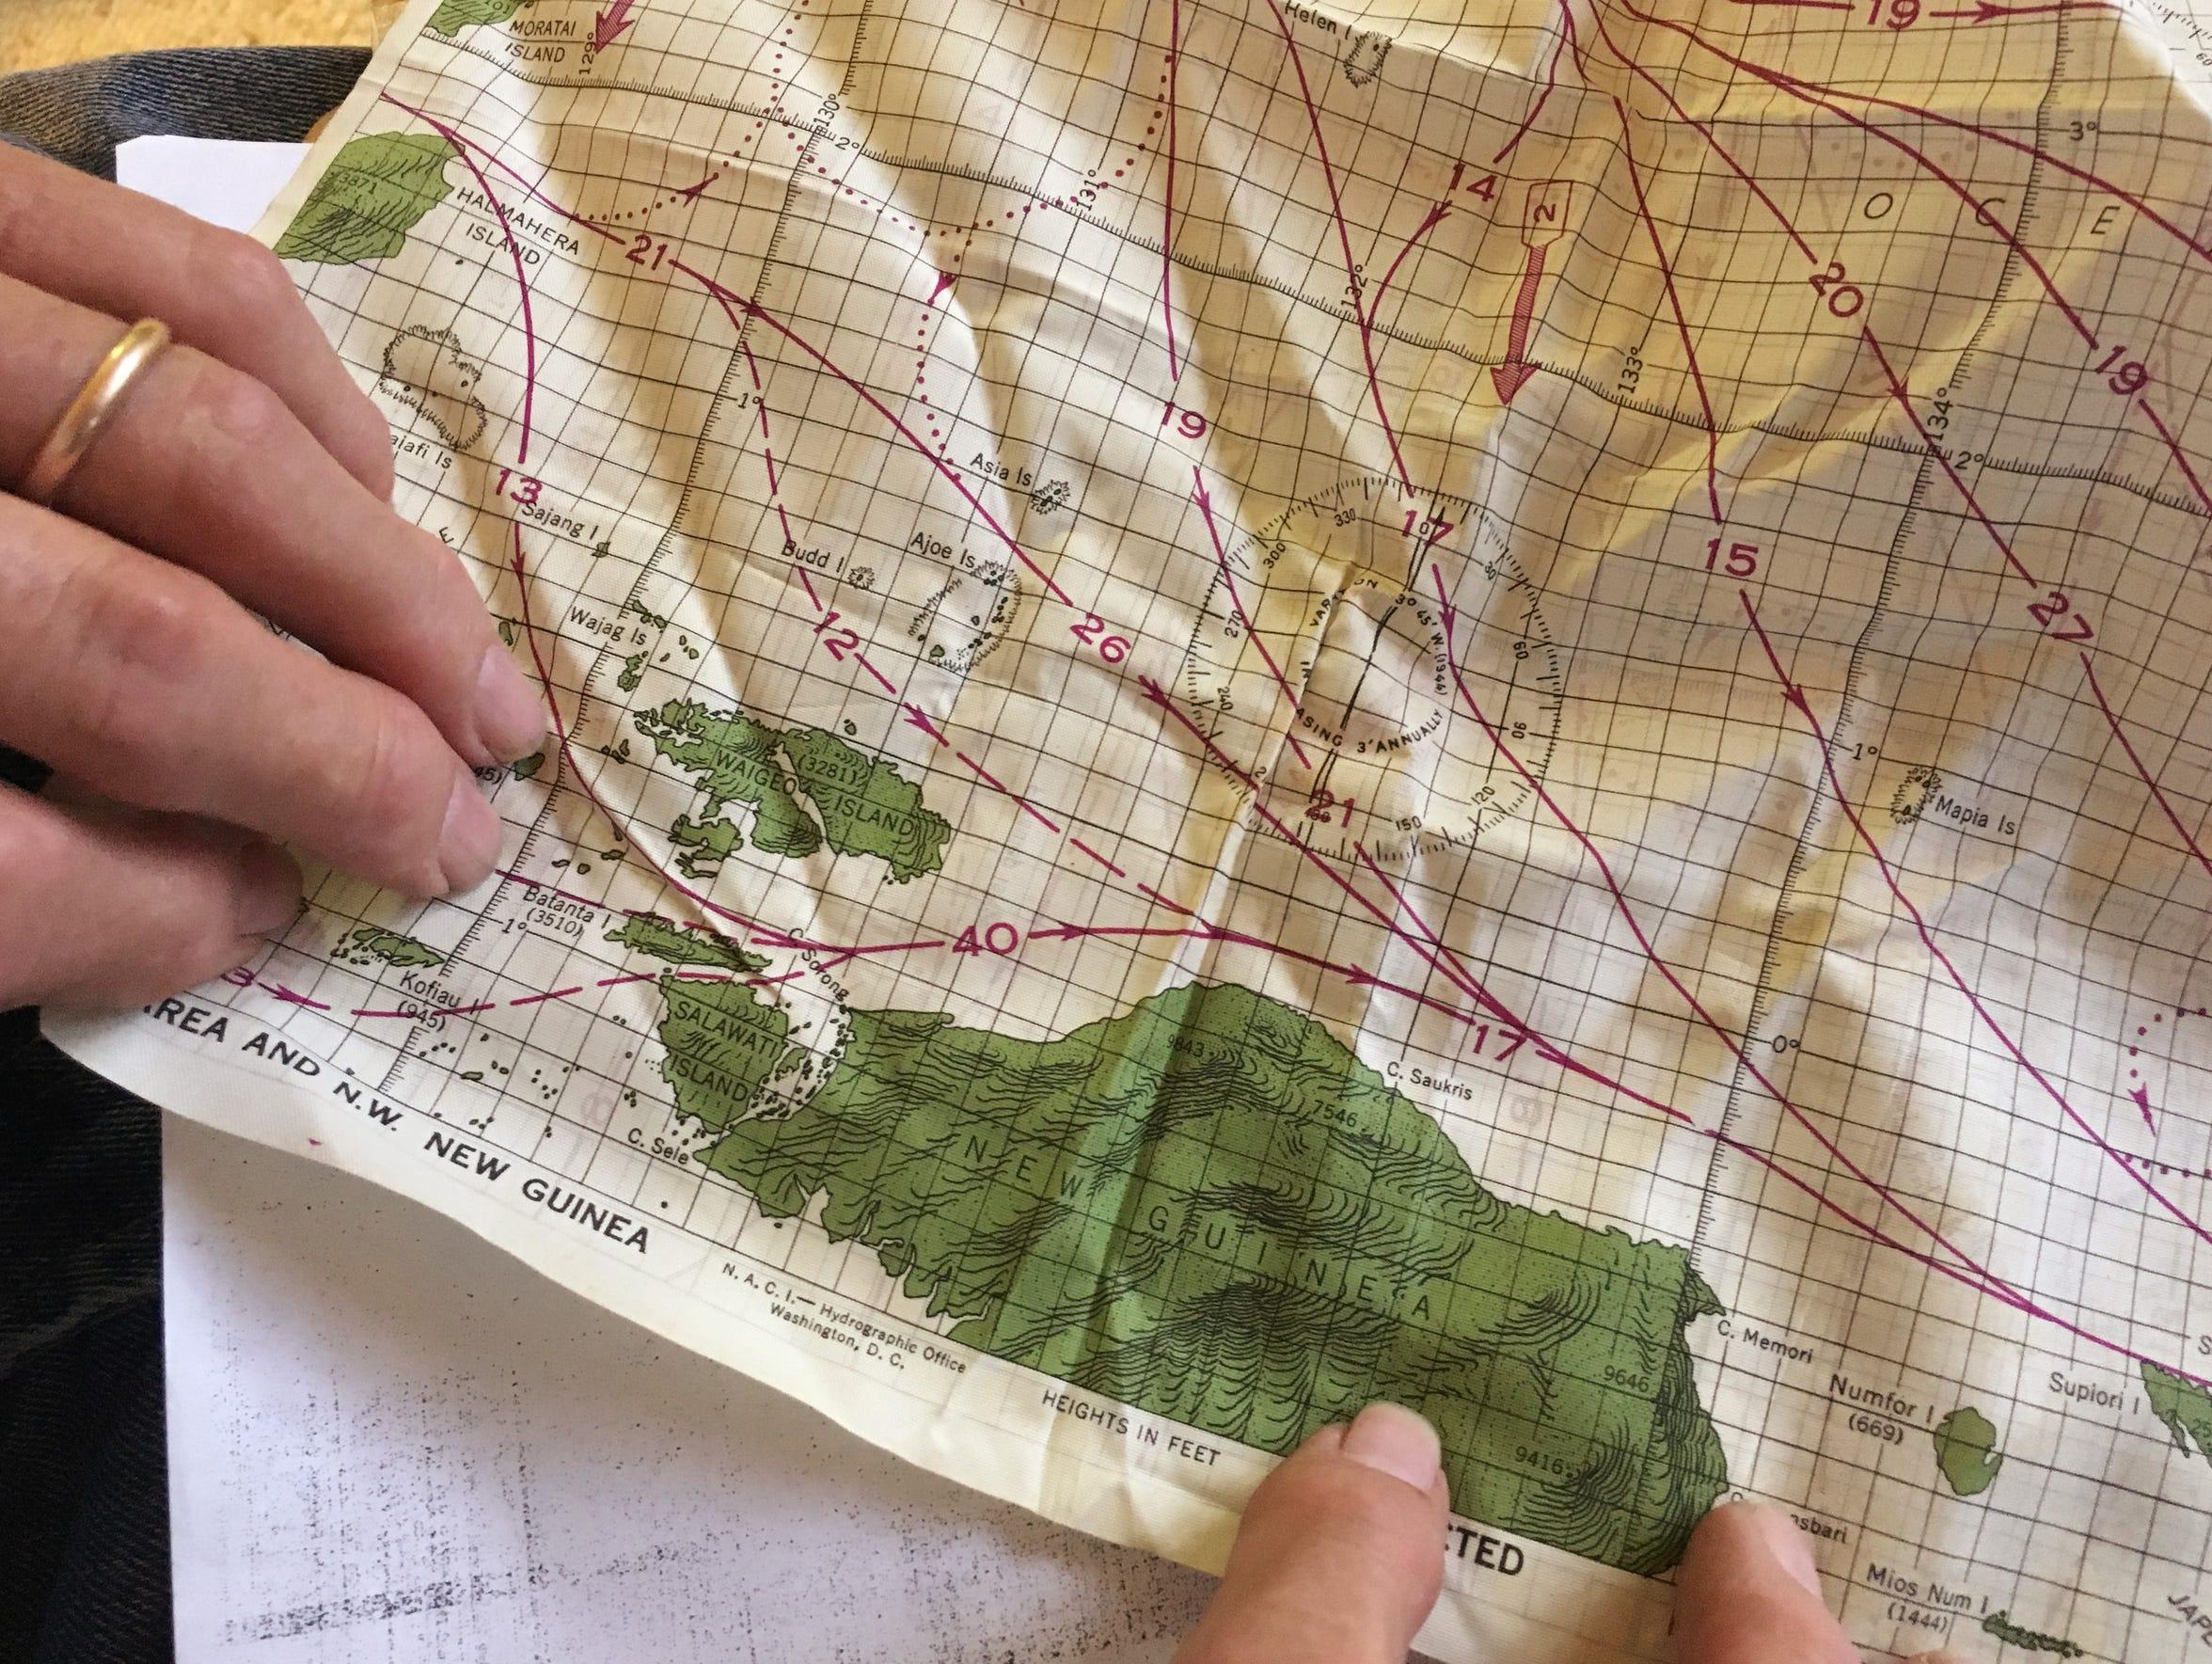 Leo Bundschuh hold a silk map of New Guinea he kept